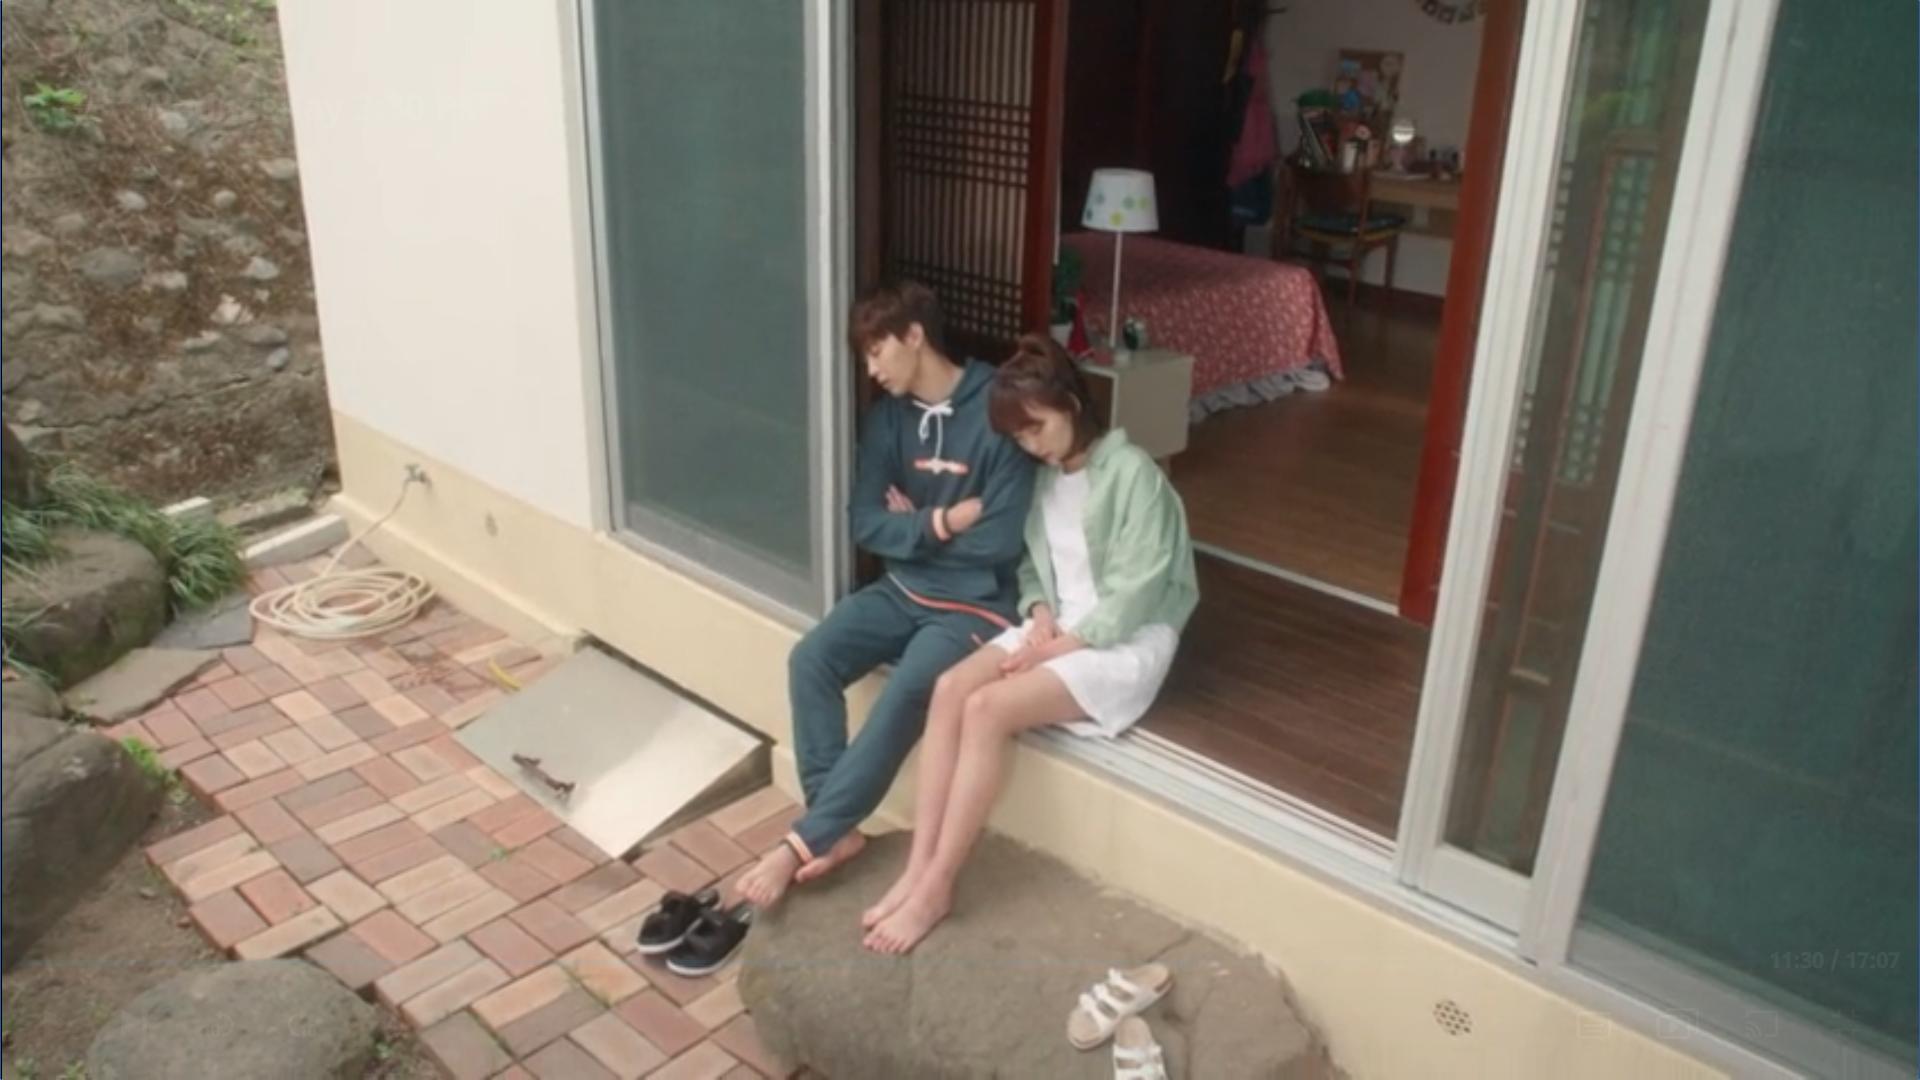 Wednesday 3:30 PM Seon Eun-woo and Yoon Jae-won napping after laundry